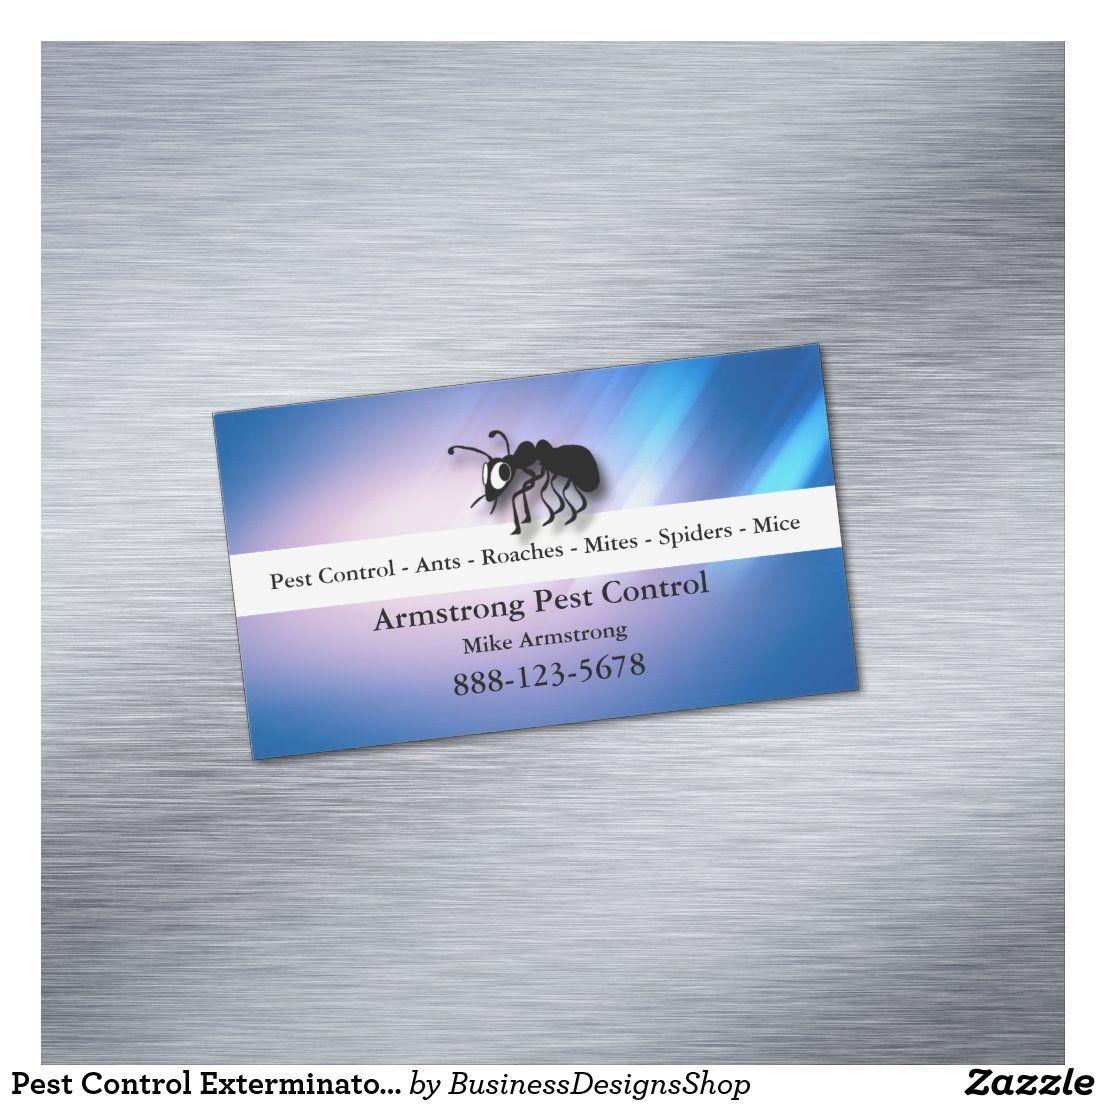 Pest Control Exterminator Ant Magnetic Business Card Zazzle Com Magnetic Business Cards Pest Control Pests